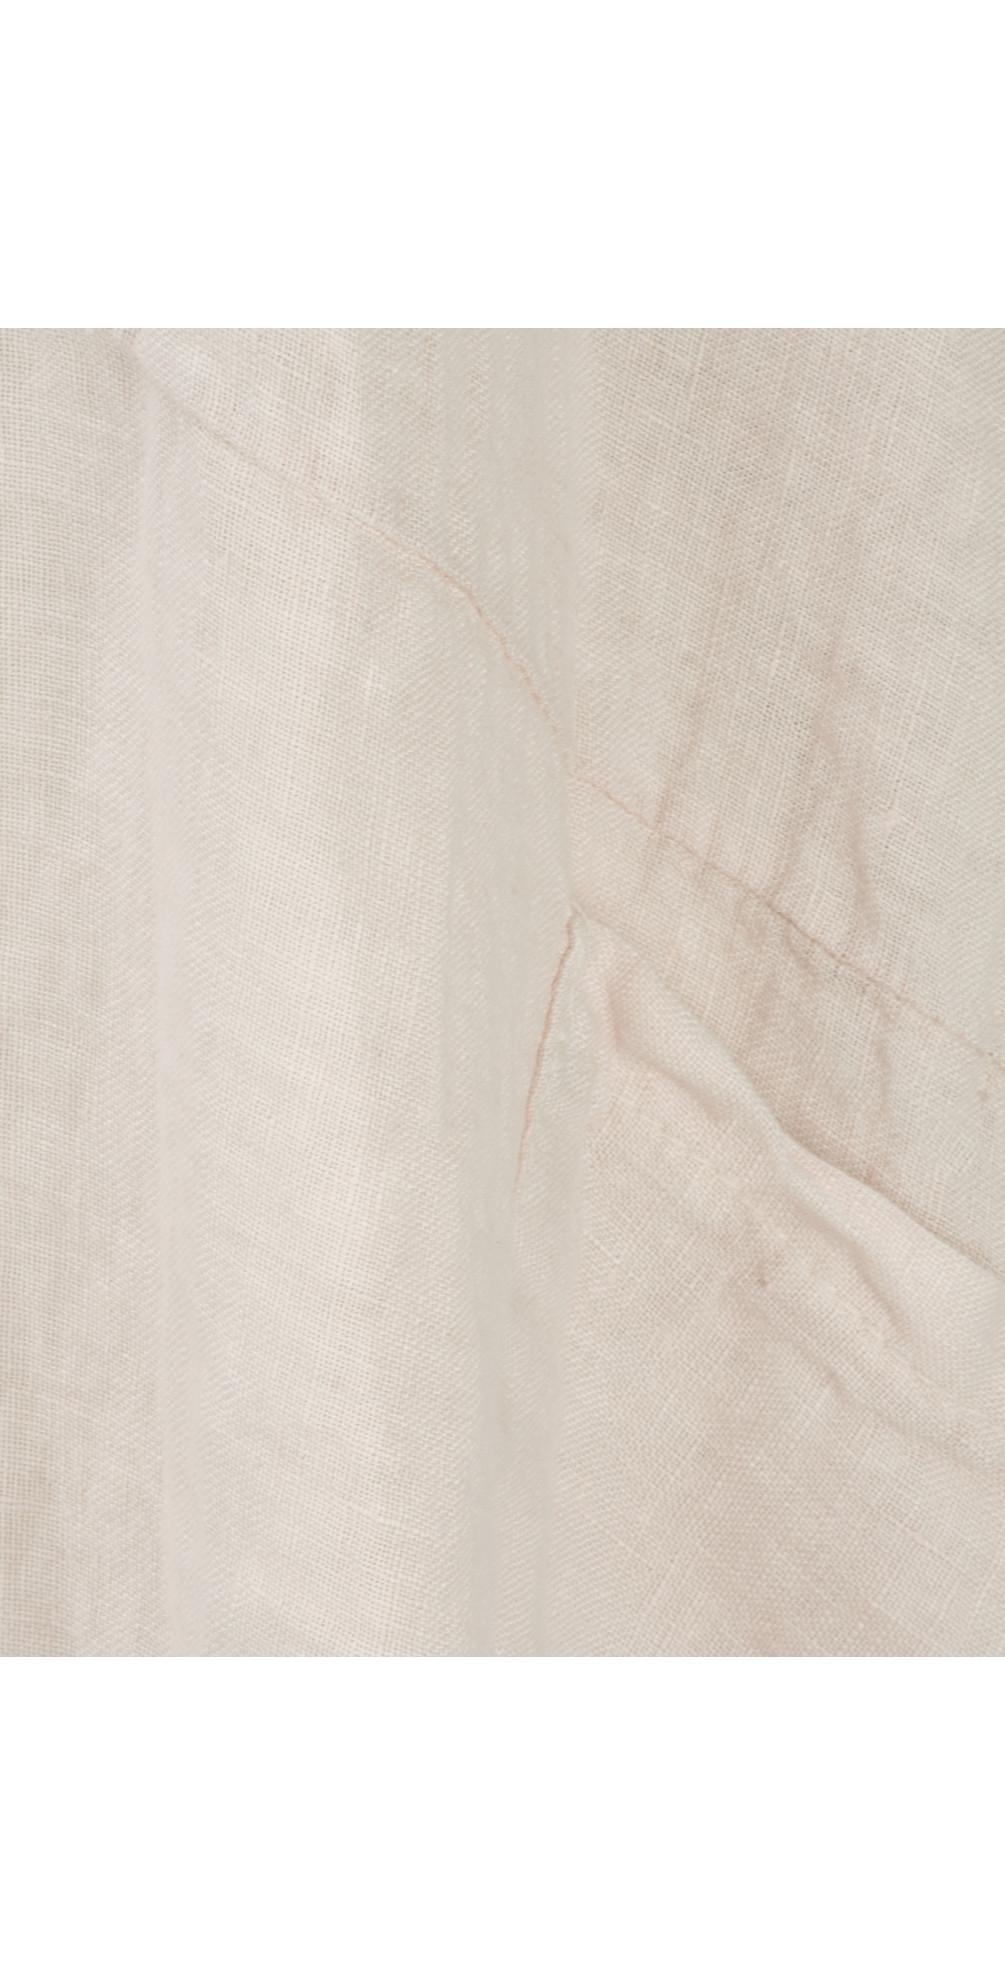 Dessie Oversized Tunic with Pocket main image